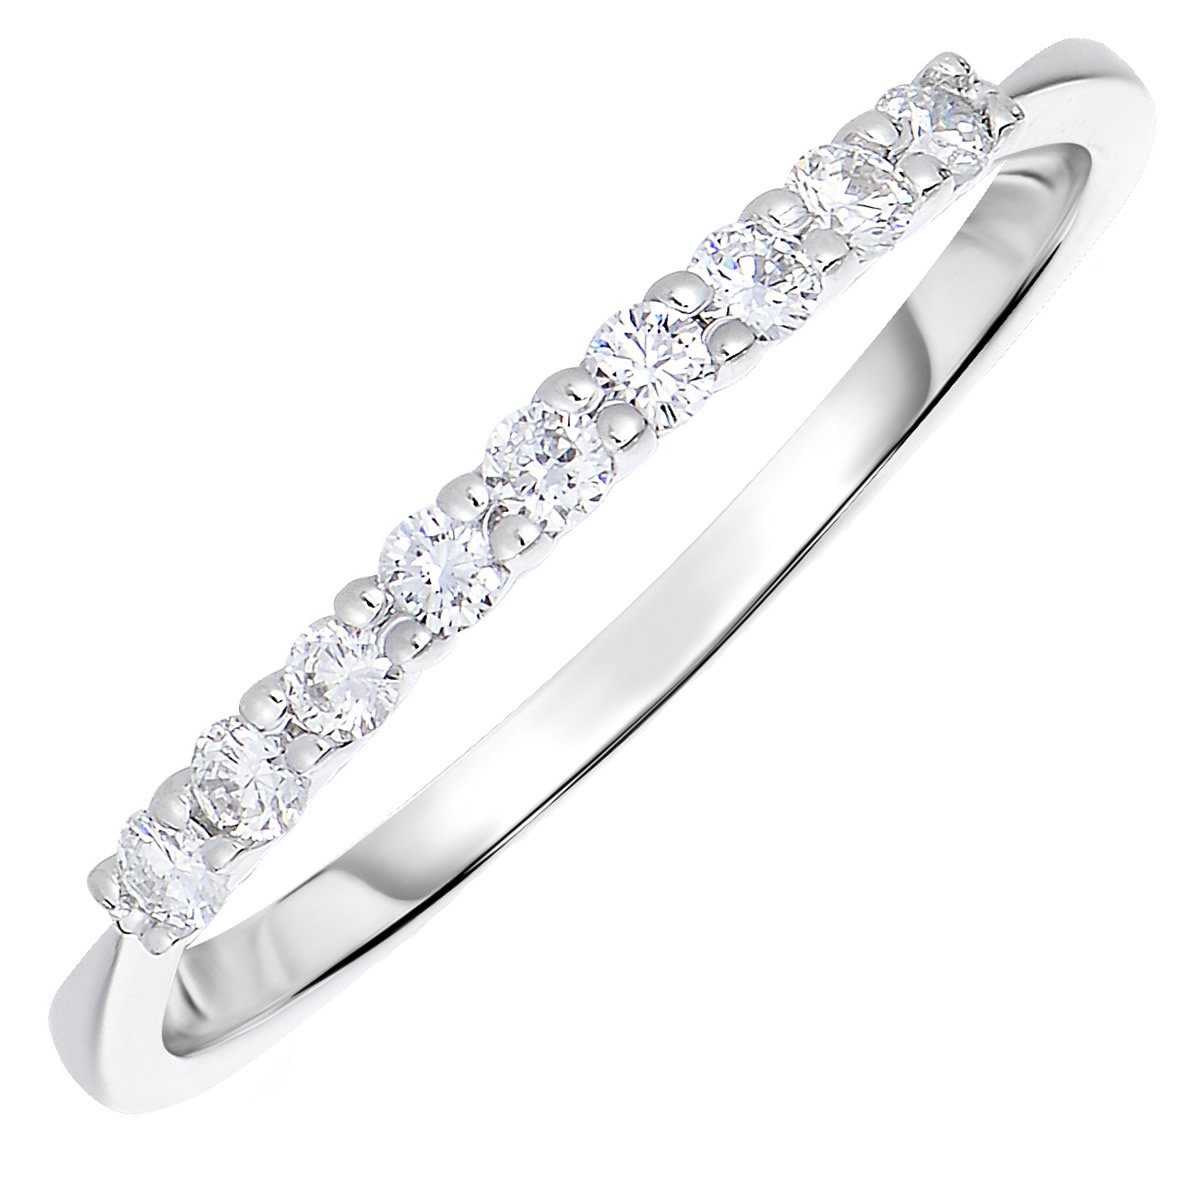 1/5 CT Petite Diamond Wedding Band 14K Gold Size 7 by Vir Jewels